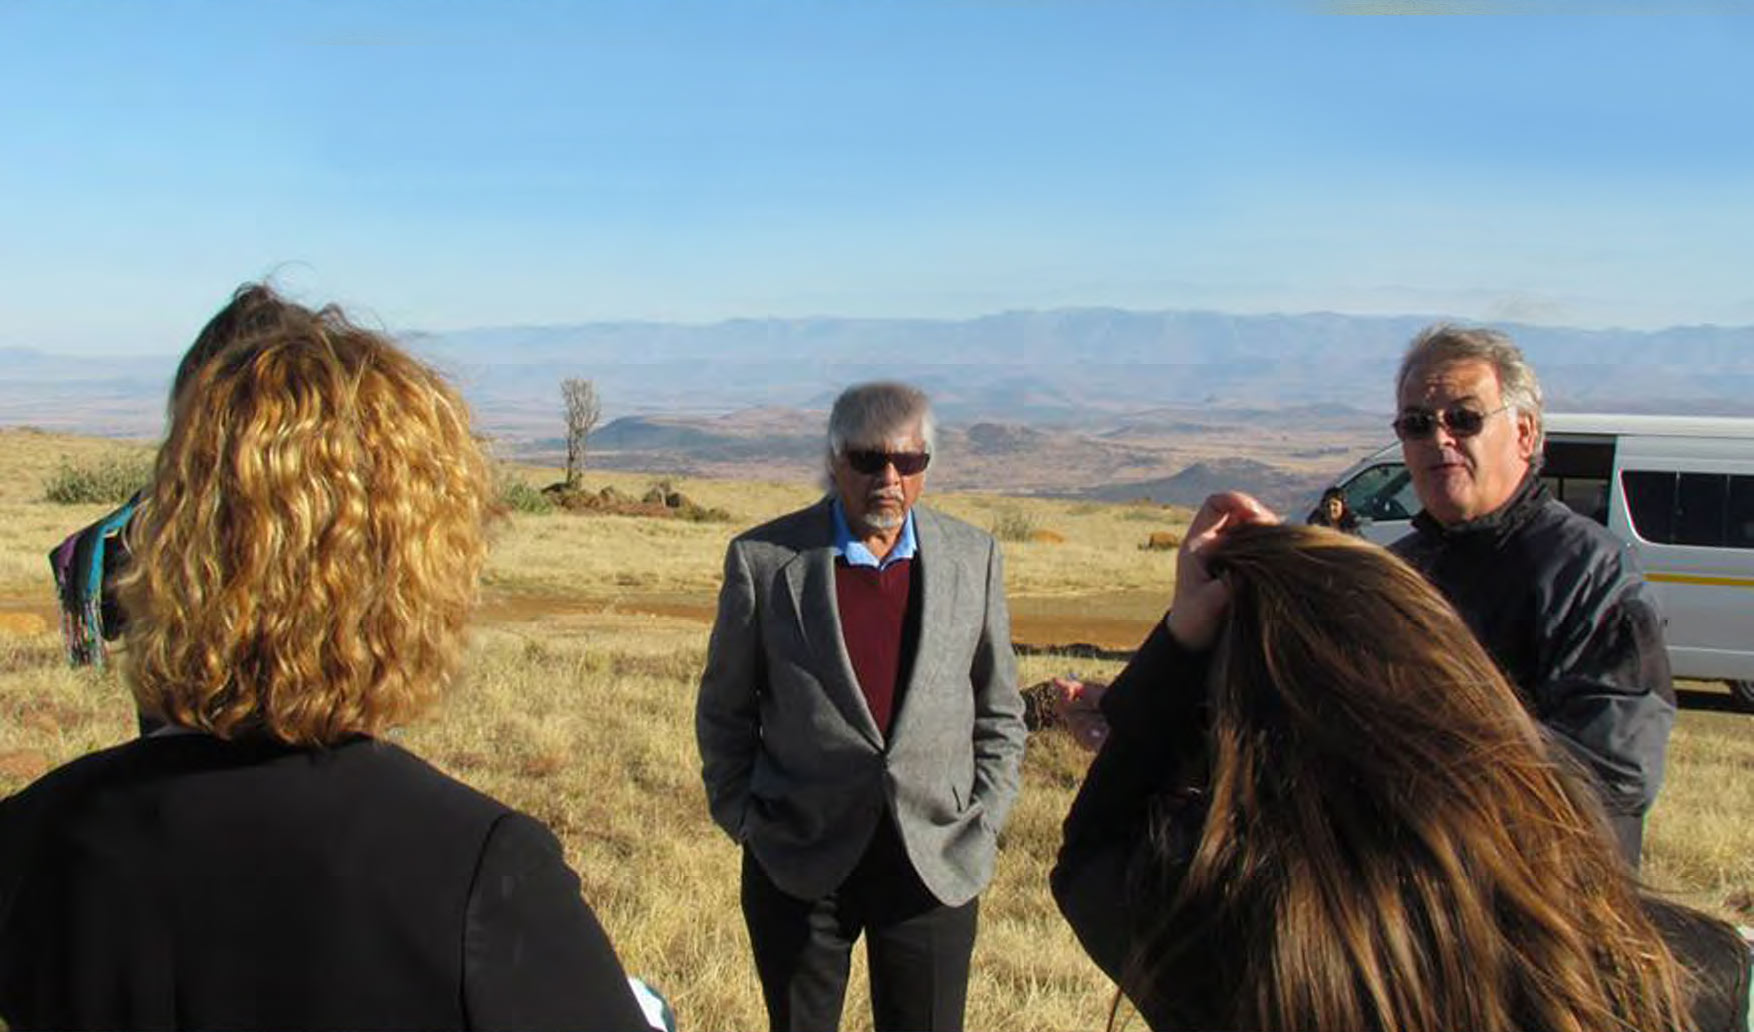 Tour guide Greg Garson and Gandhi grandson at Spioenkop